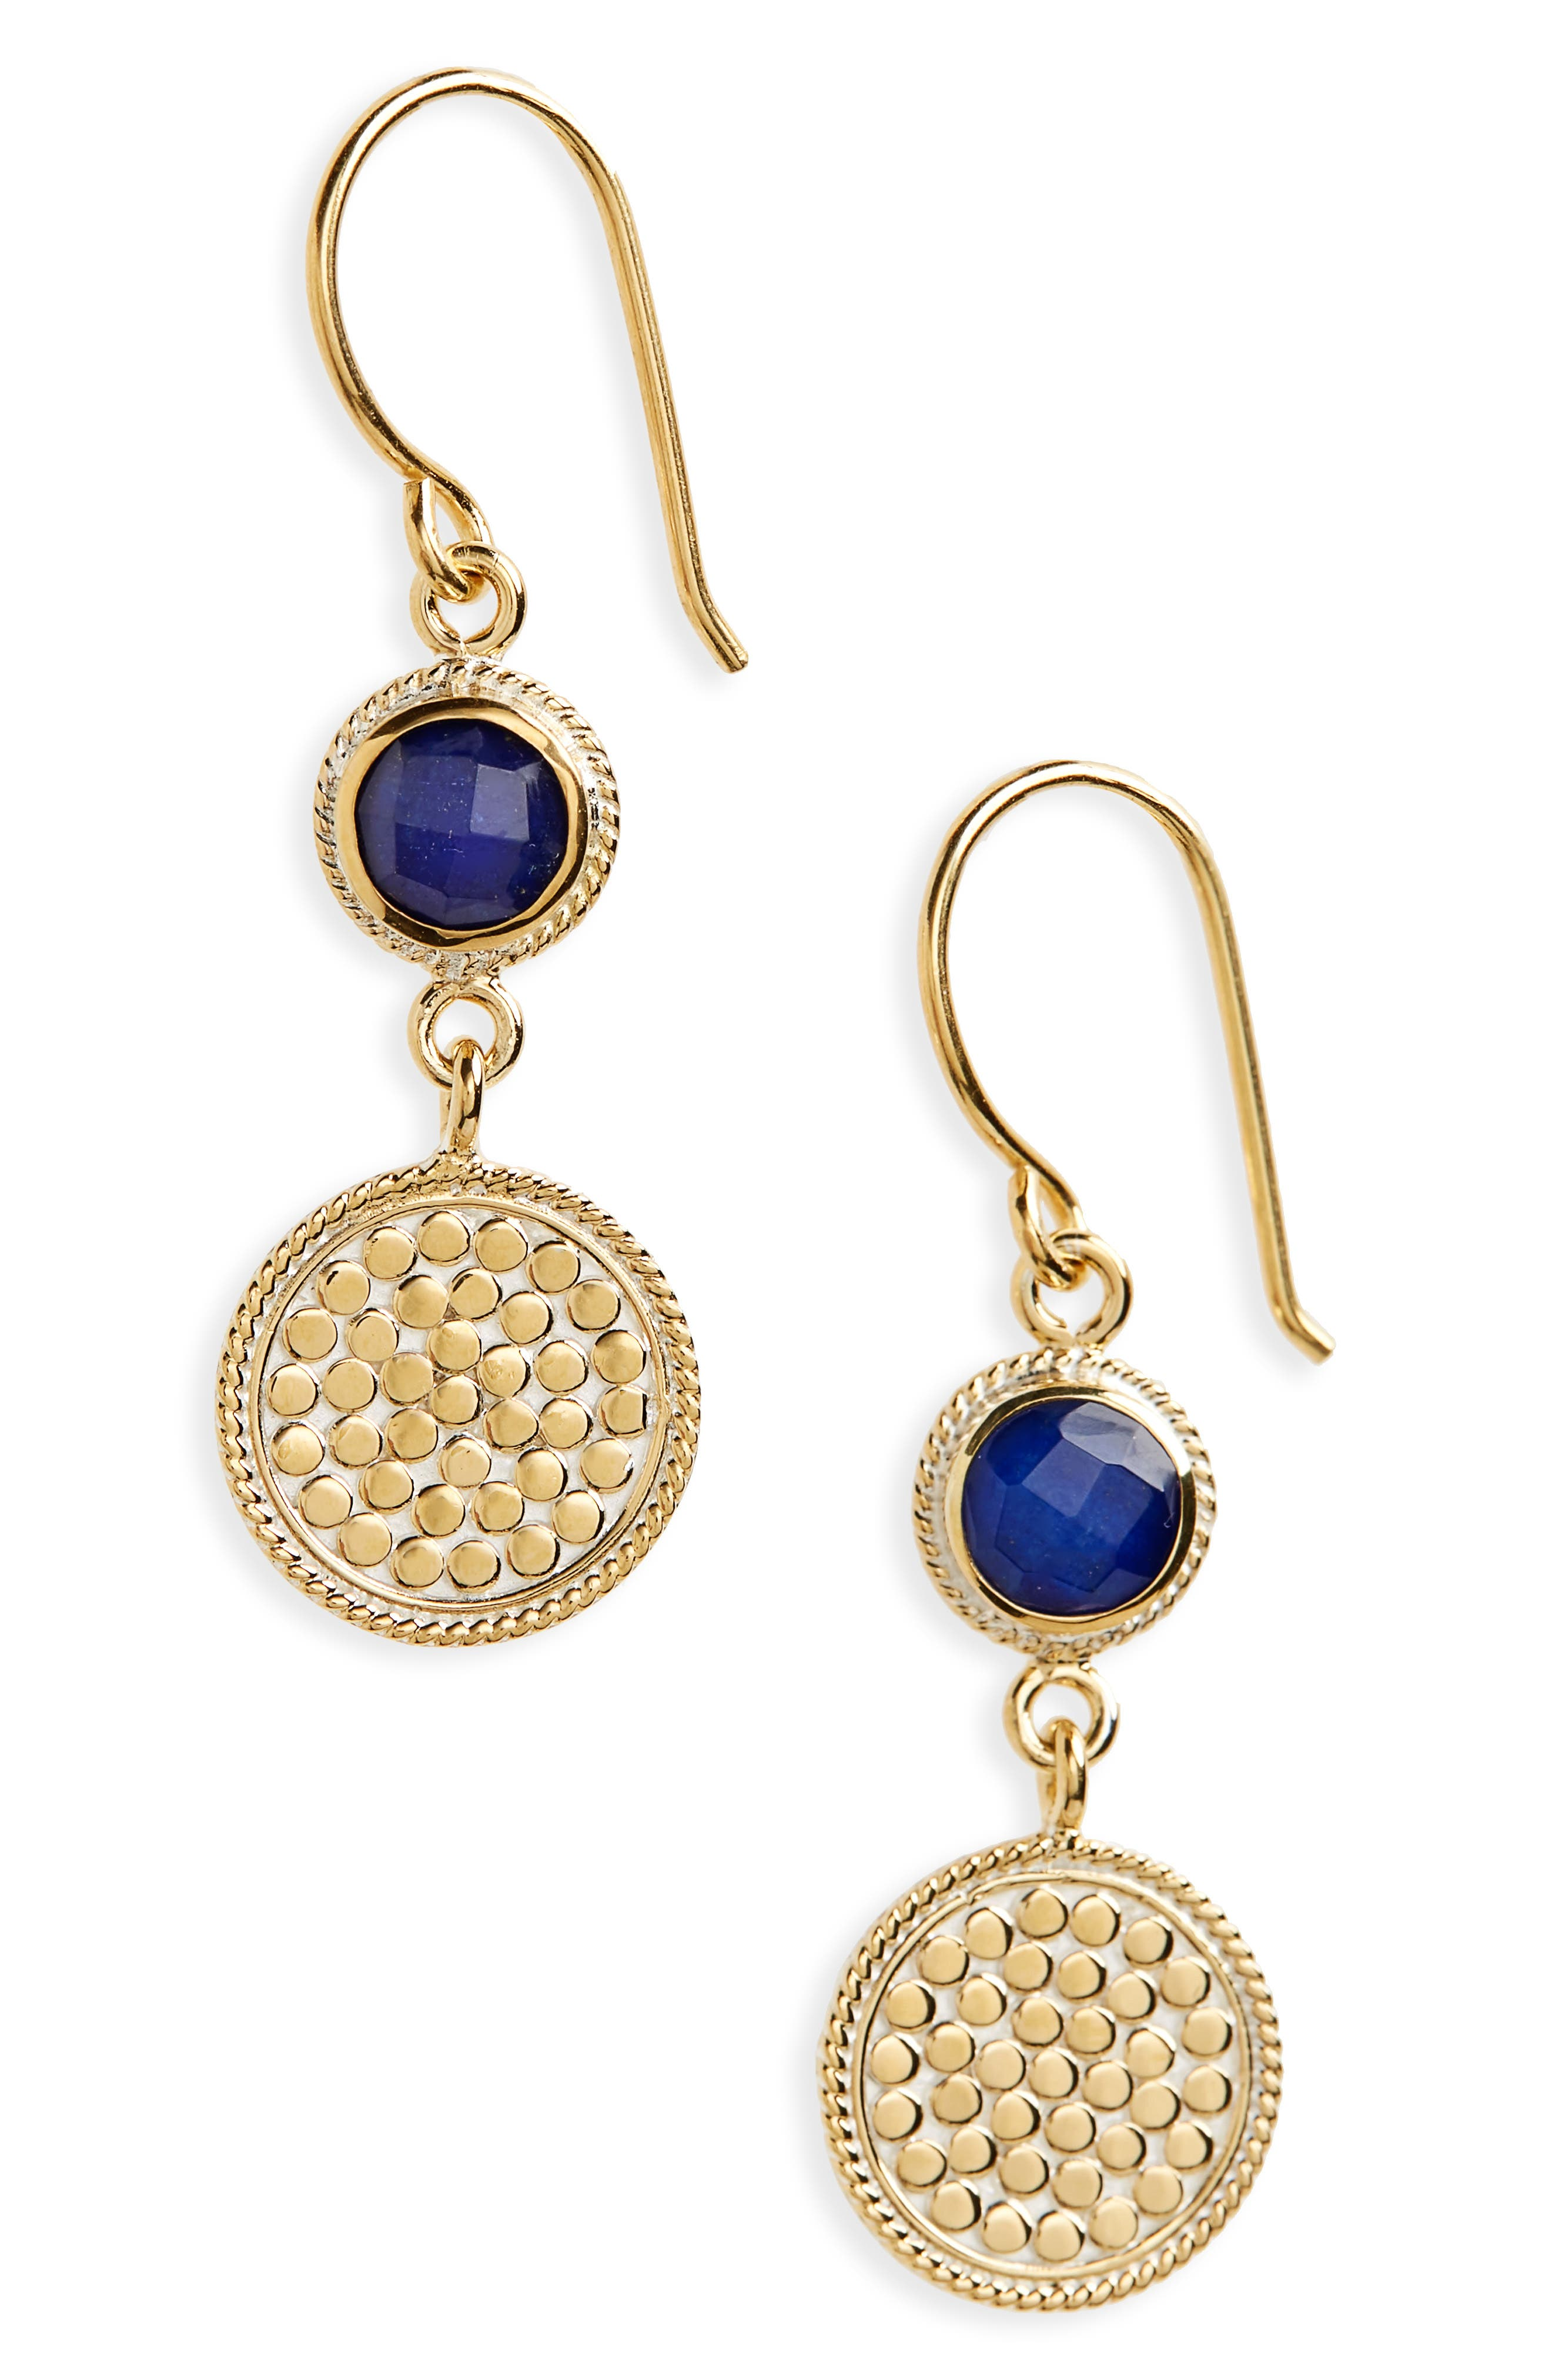 Semiprecious Stone Double Drop Earrings,                             Main thumbnail 1, color,                             BLUE LAPIS